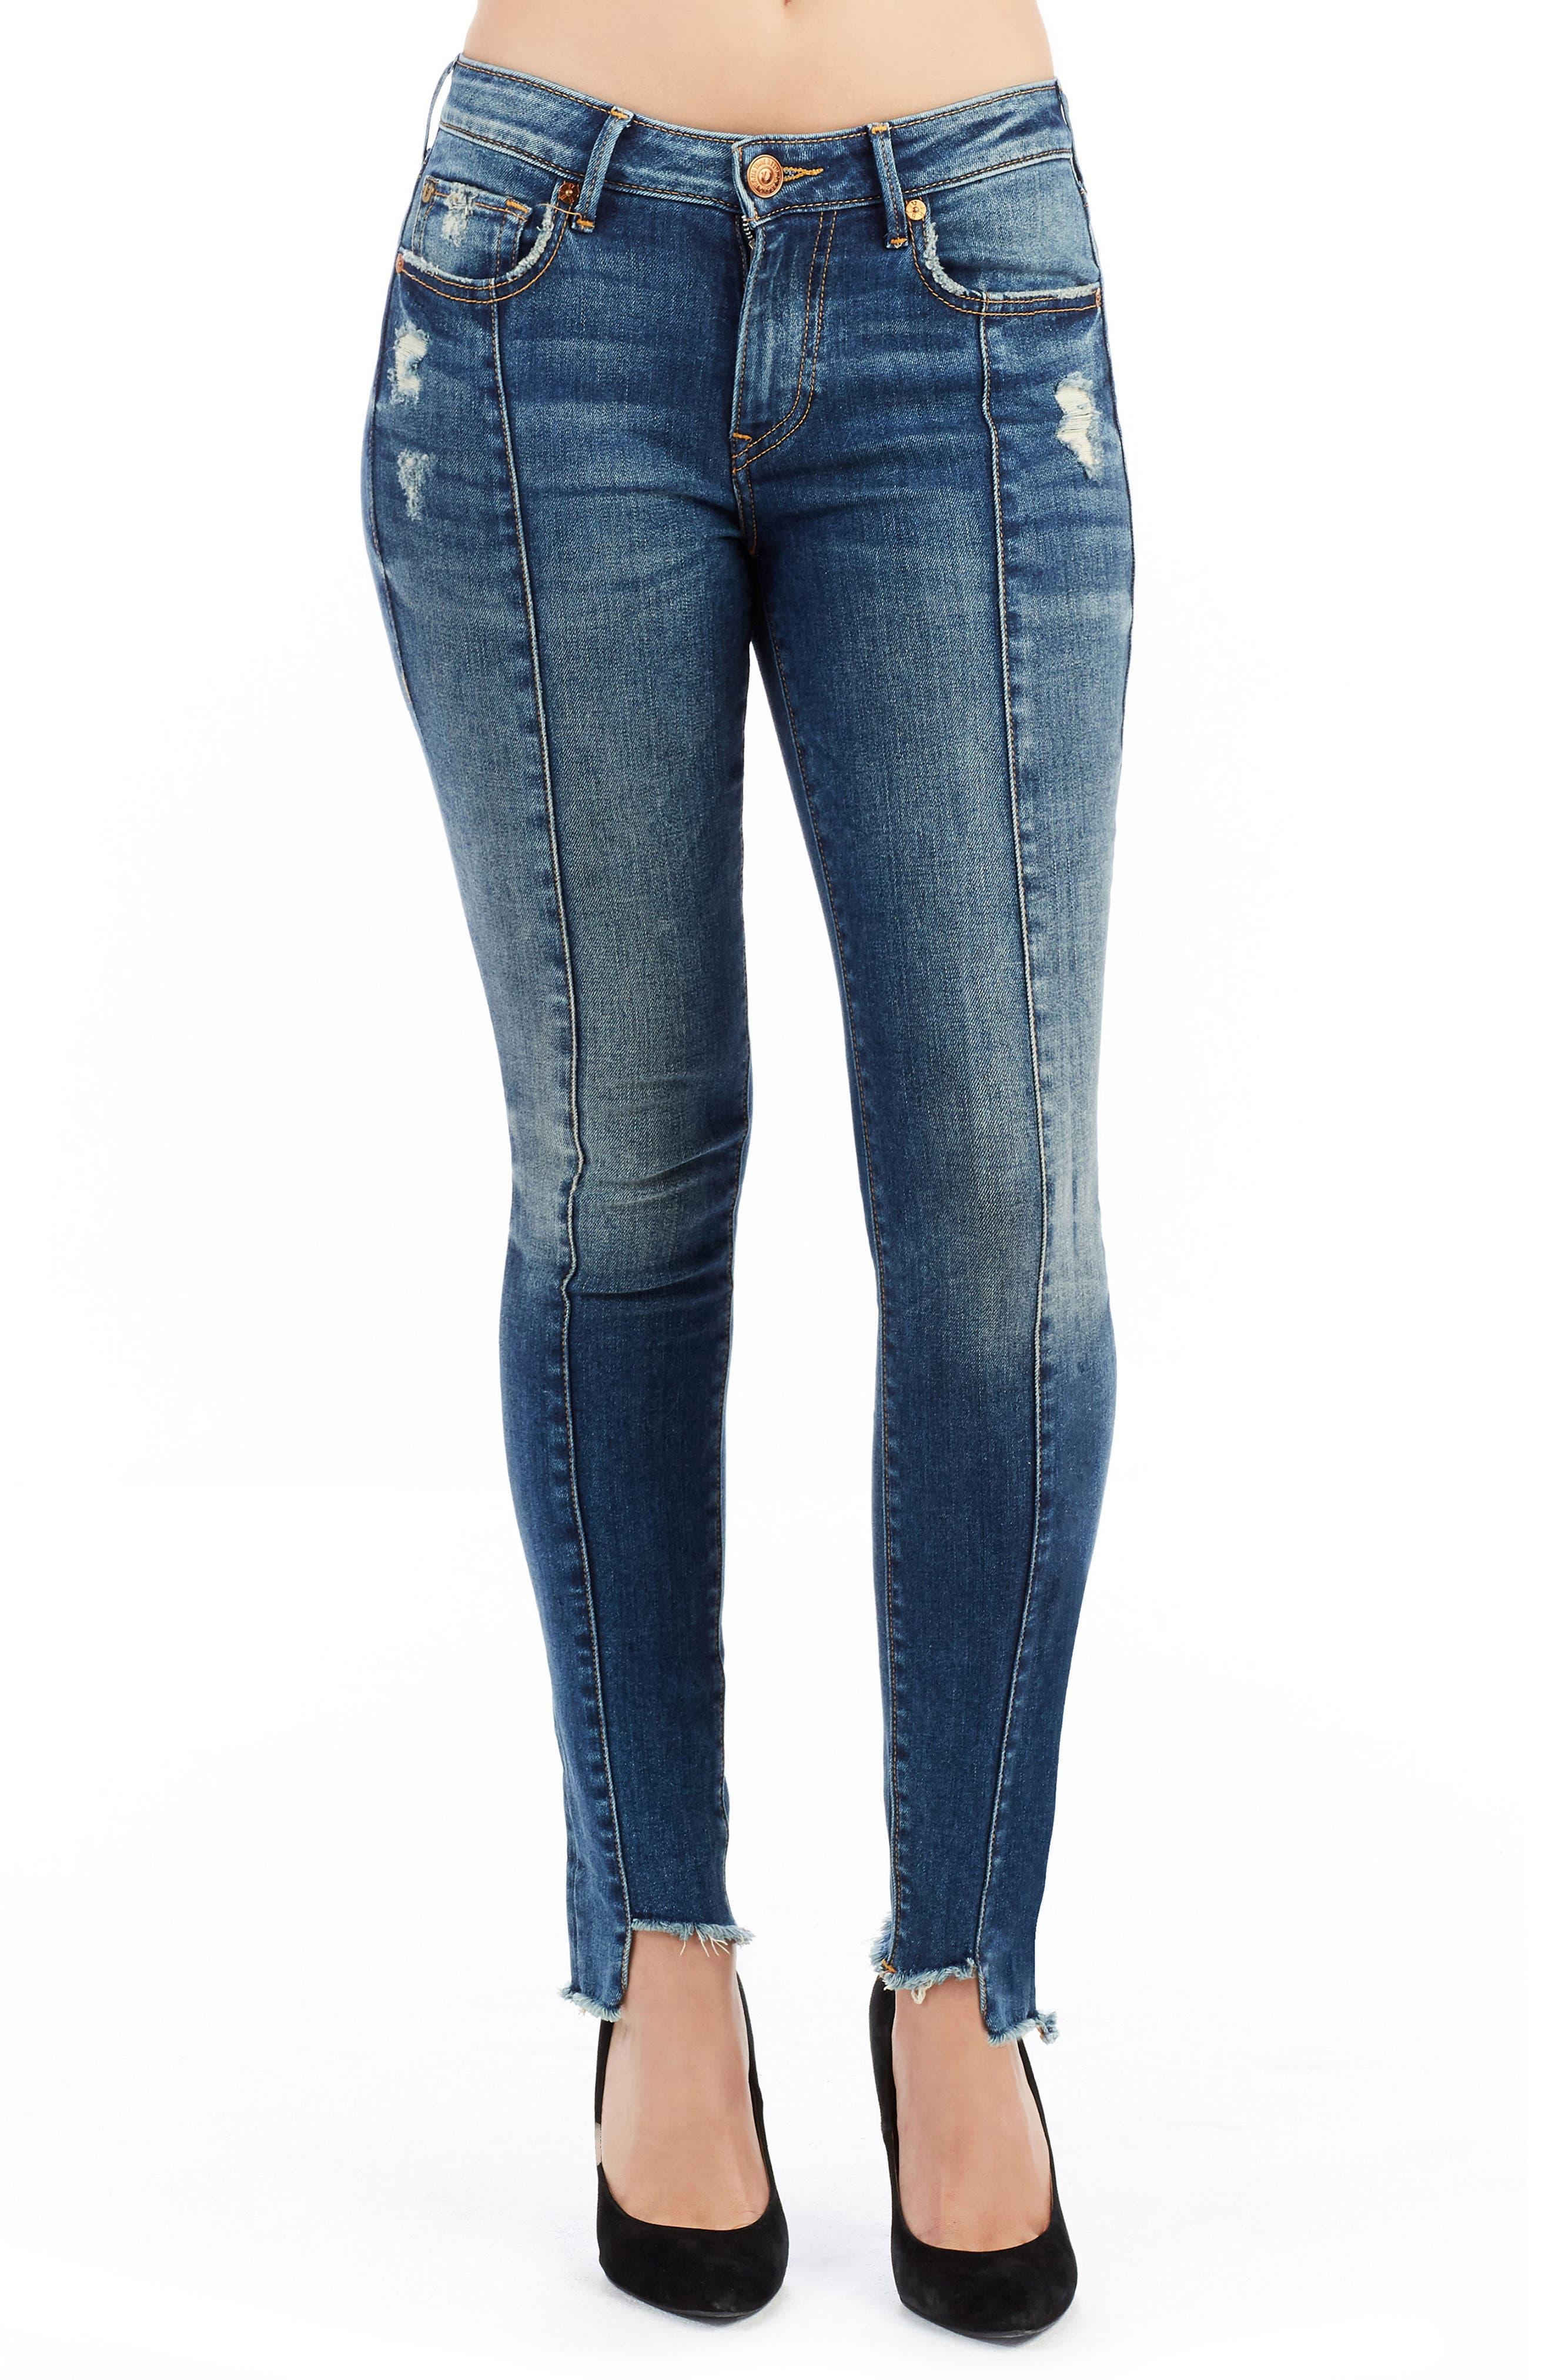 Jennie Curvy Skinny Jeans,                         Main,                         color, Famous Blue Rock